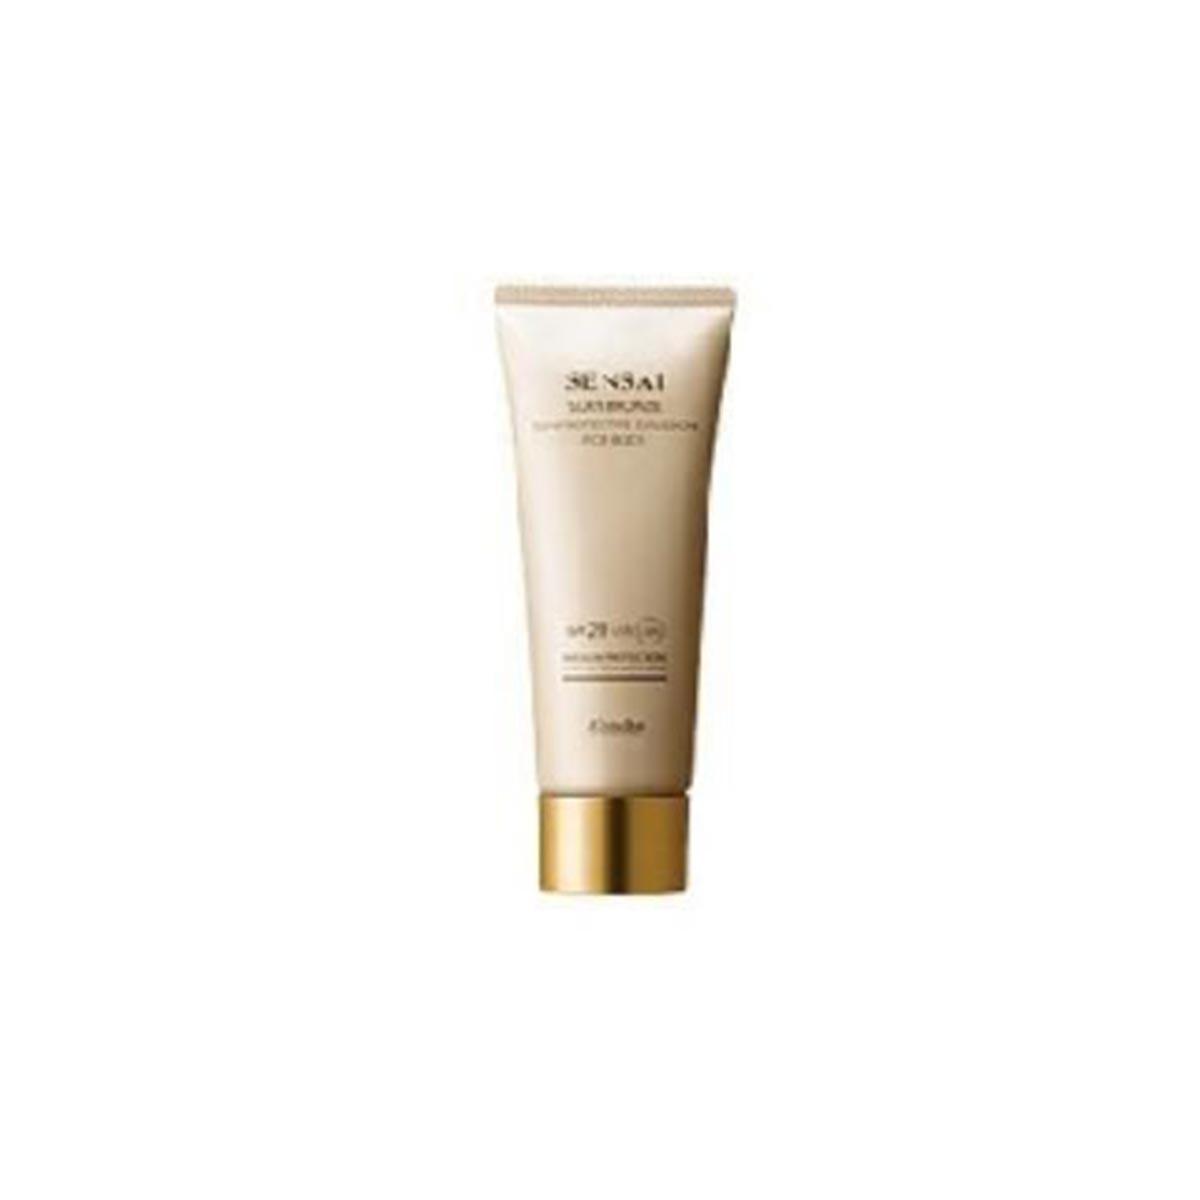 Kanebo-fragrances Sensai Silky Bronze Sun Emulsion Spf20 150ml